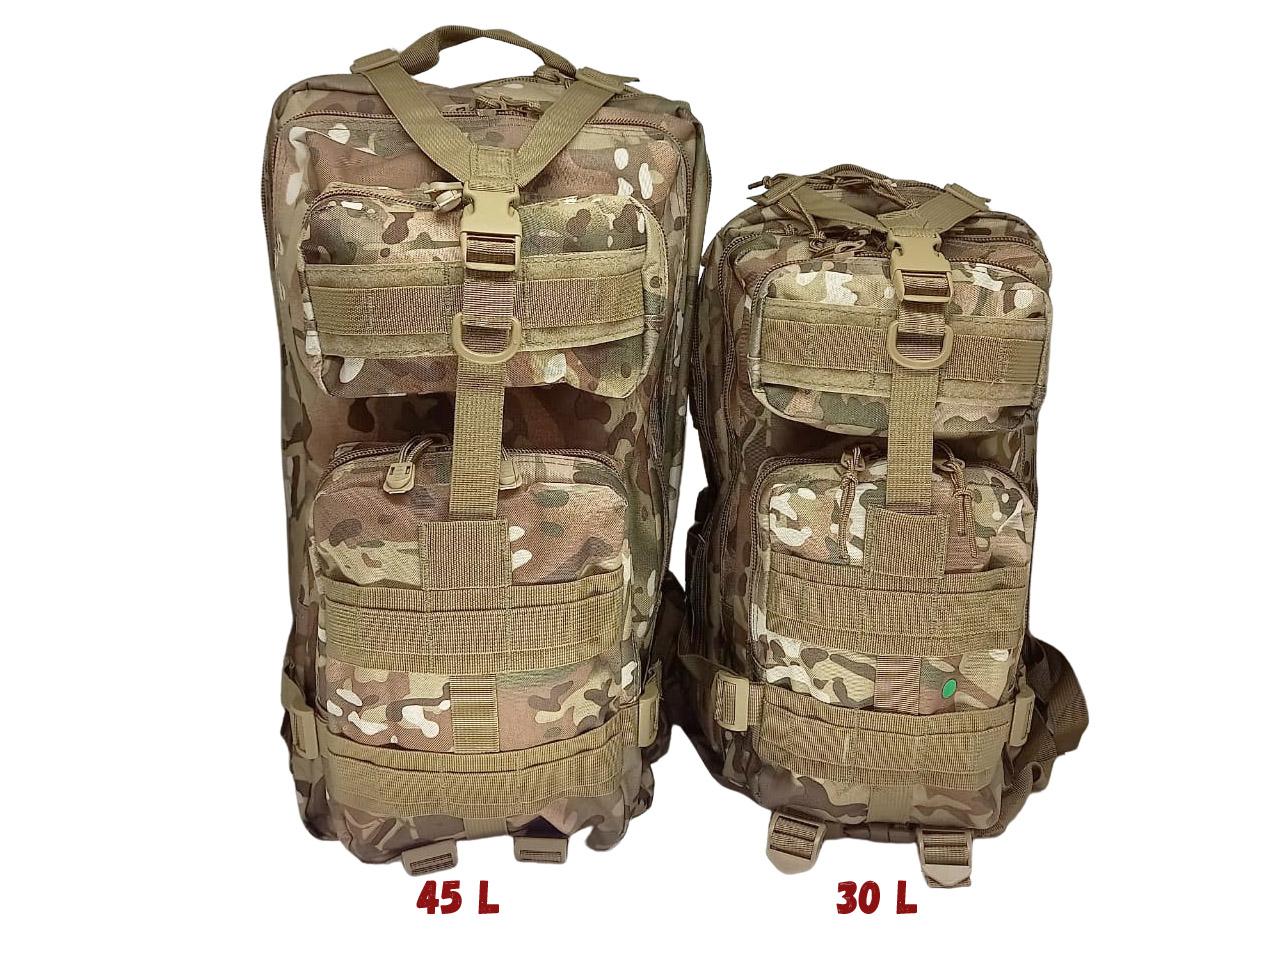 Mochila Tatica Militar Cordura 45 L - Cor: Preta  - MAB AIRSOFT